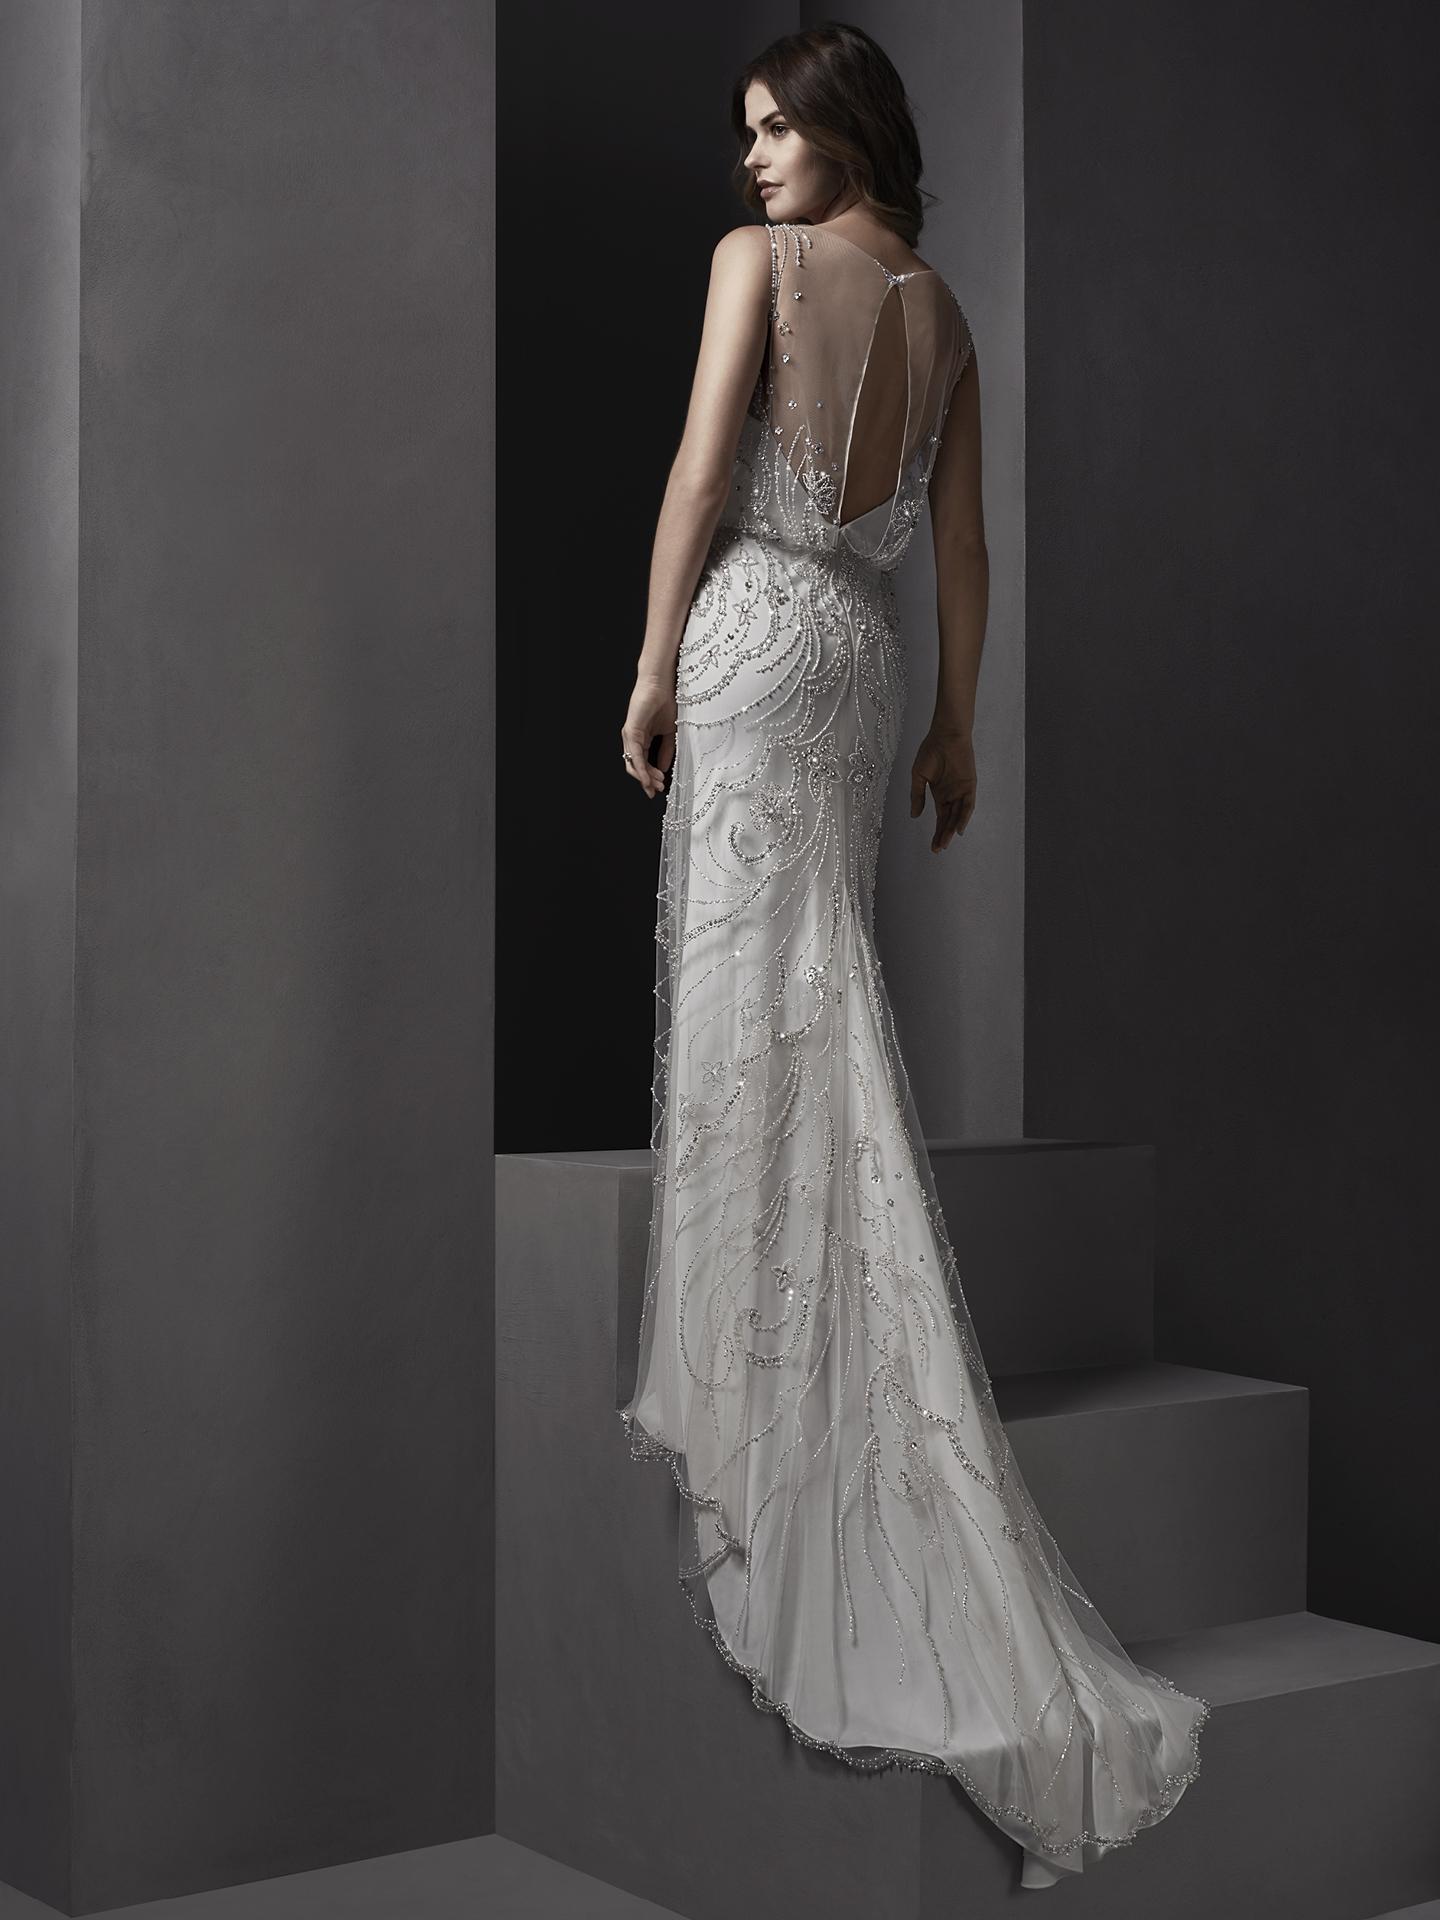 Great Gatsby Inspired Wedding Dresses